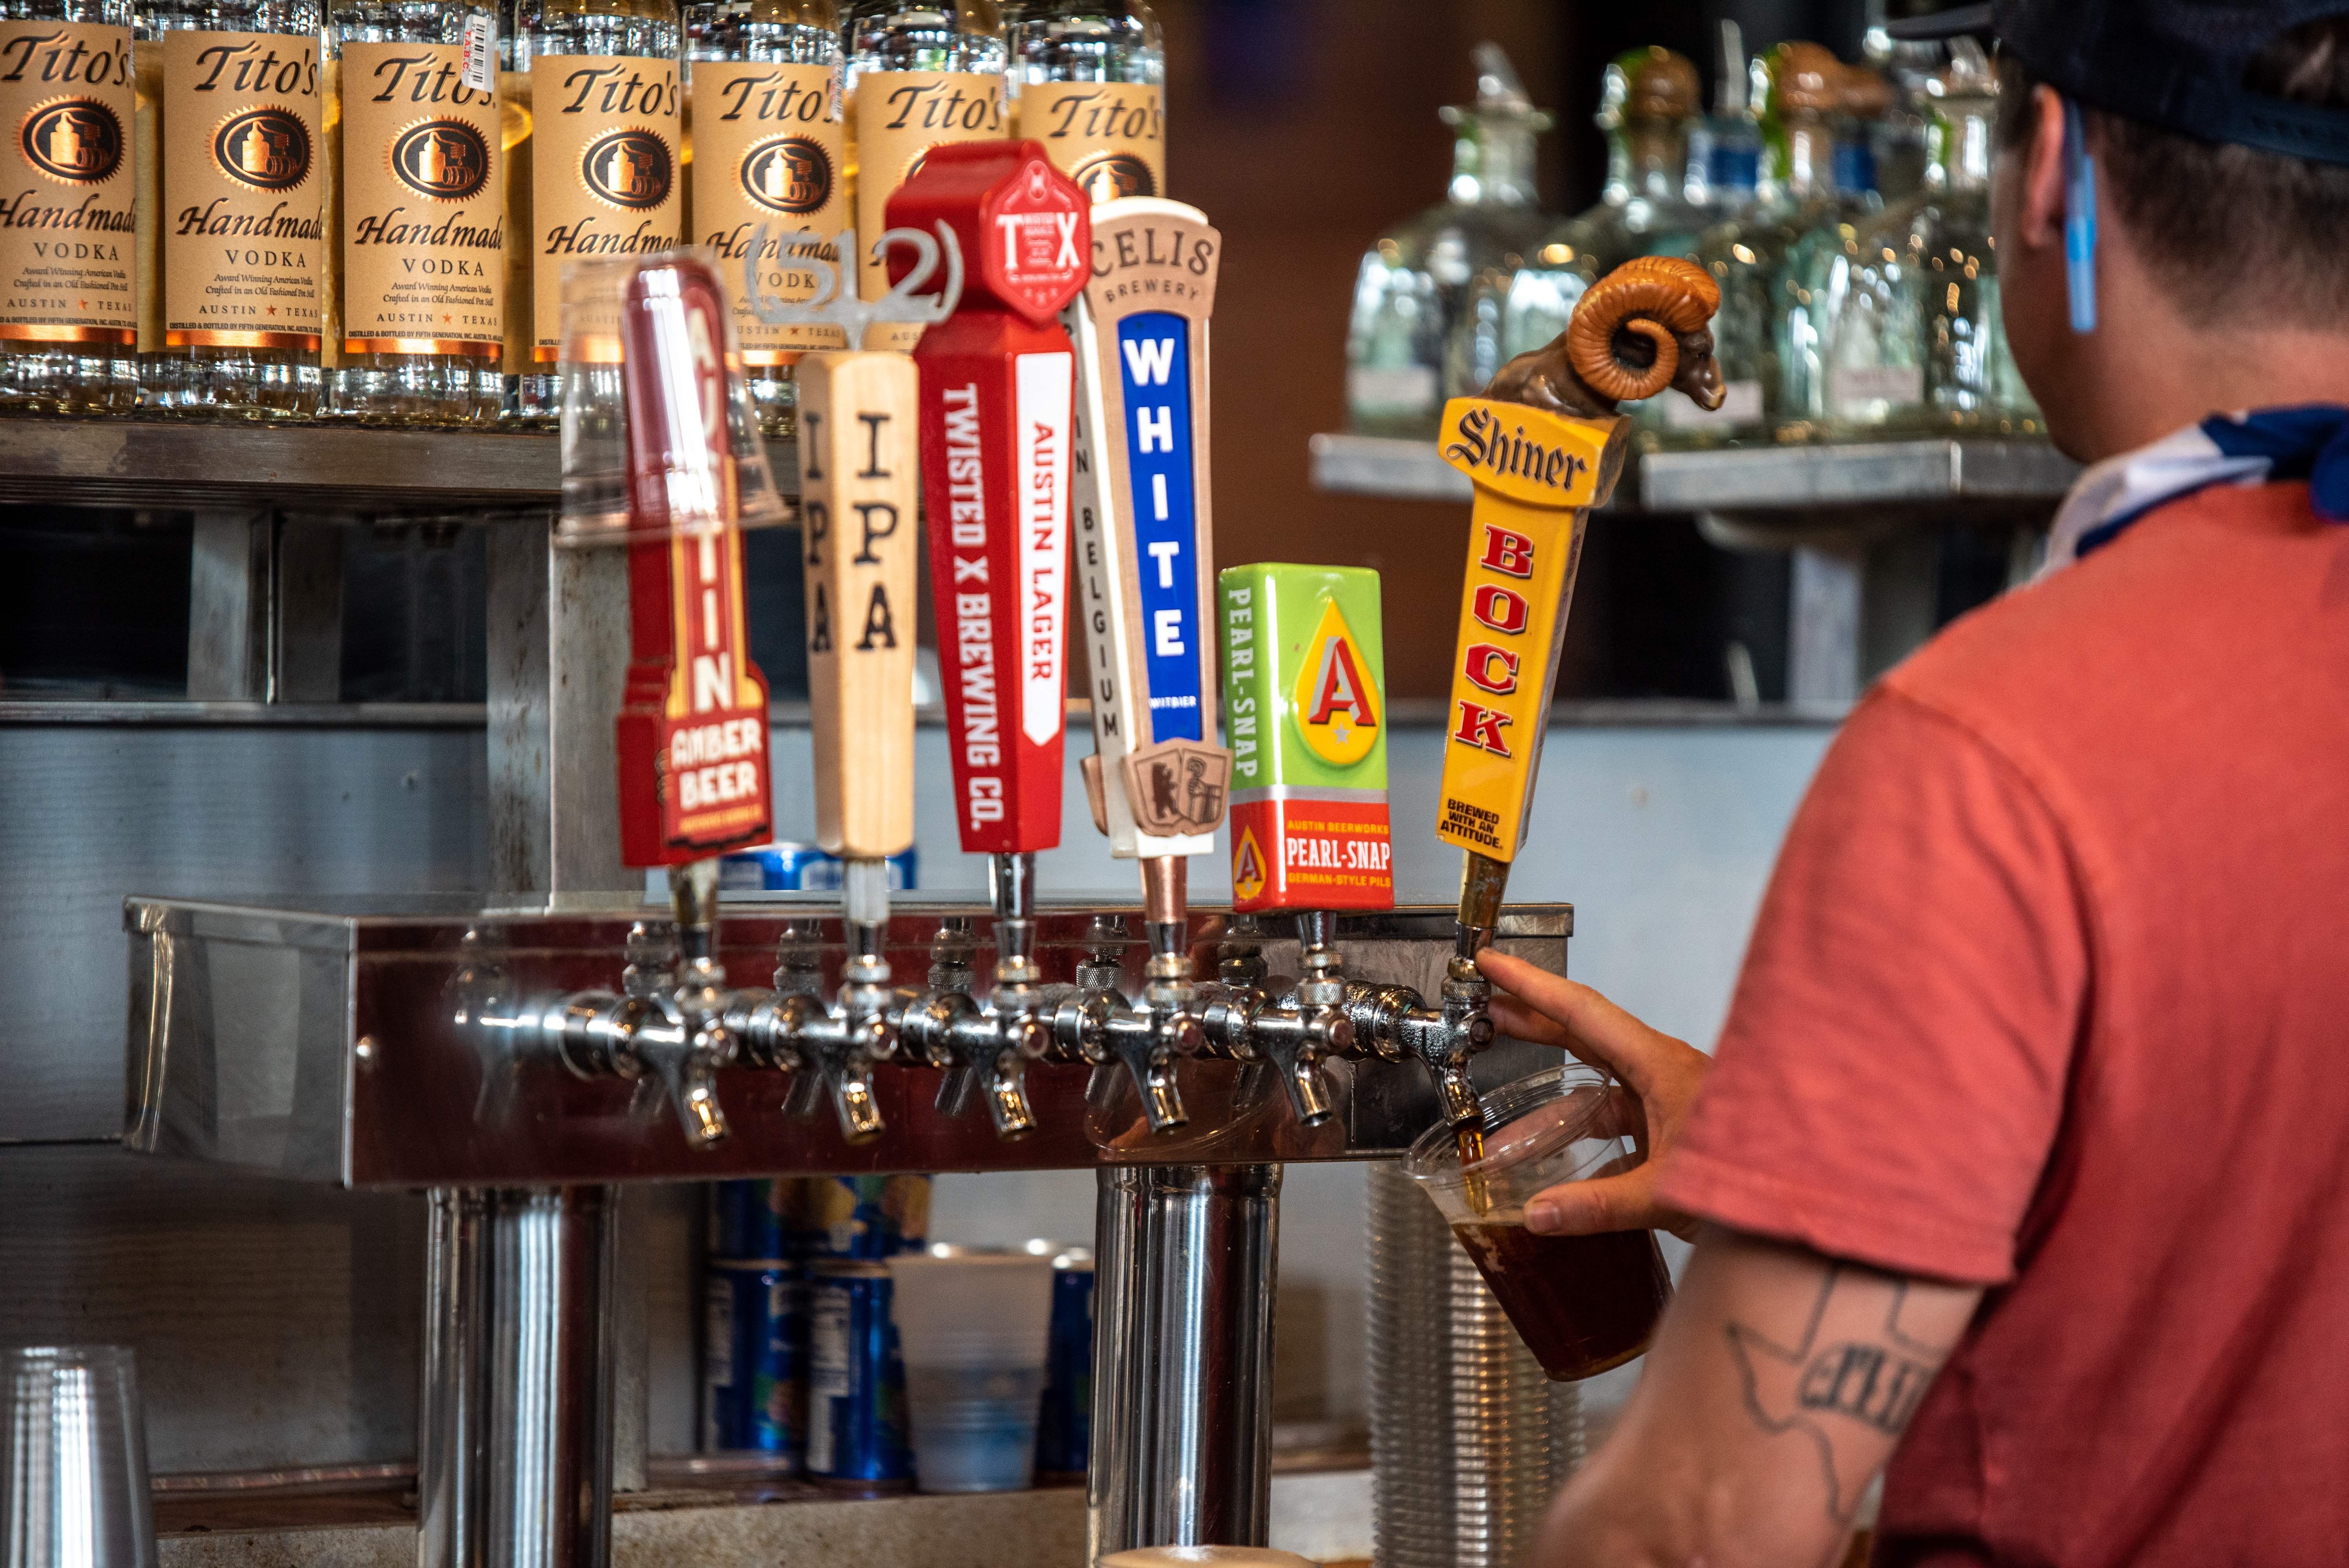 Beer taps at an Austin bar